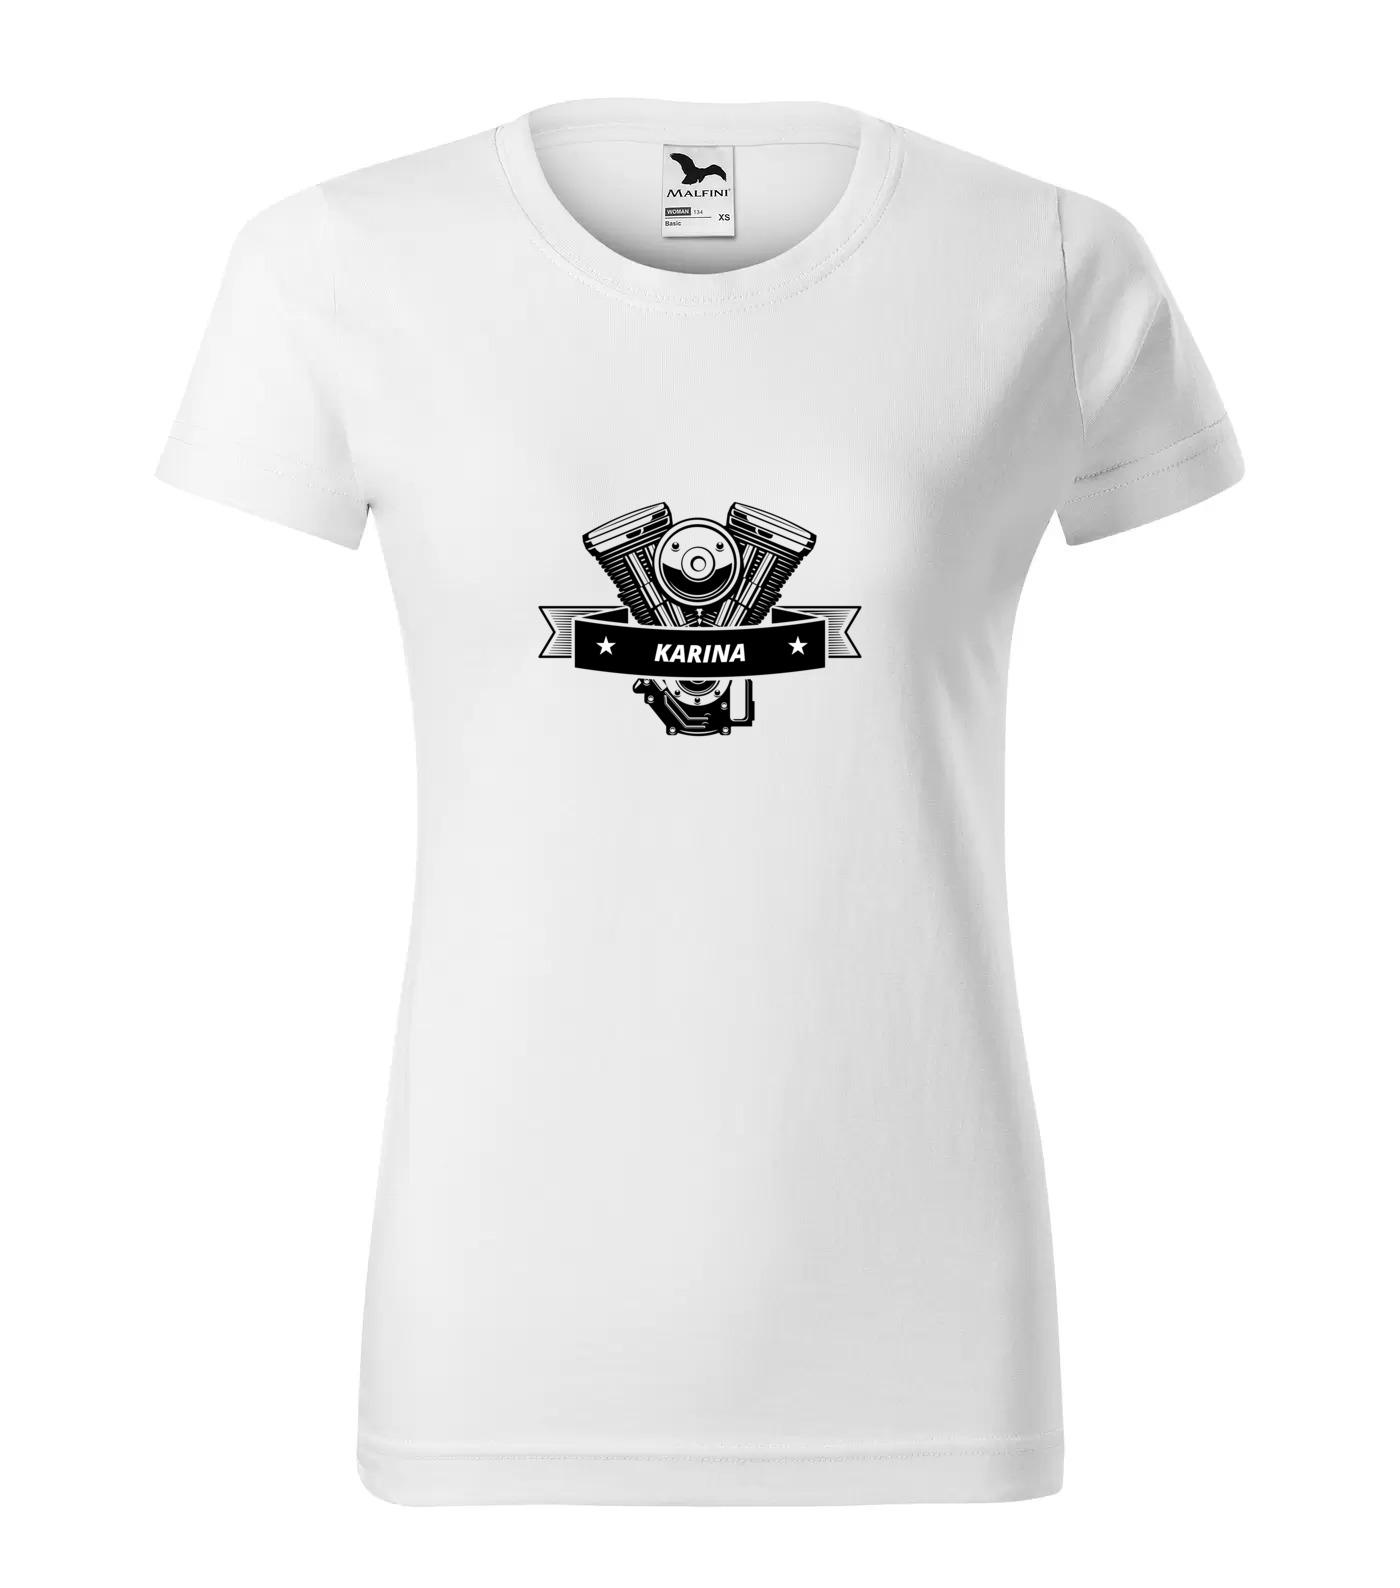 Tričko Motorkářka Karina